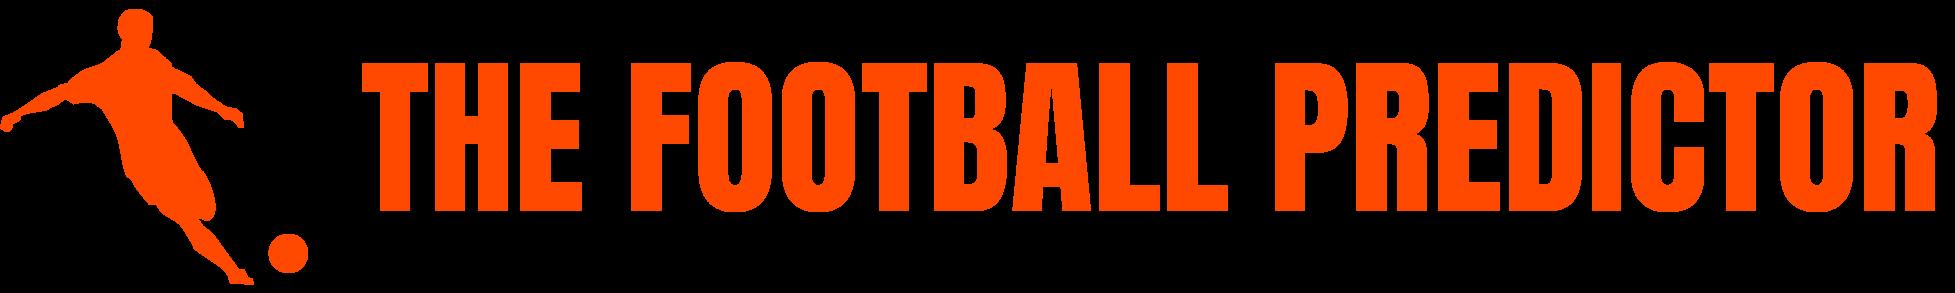 The Football Predictor